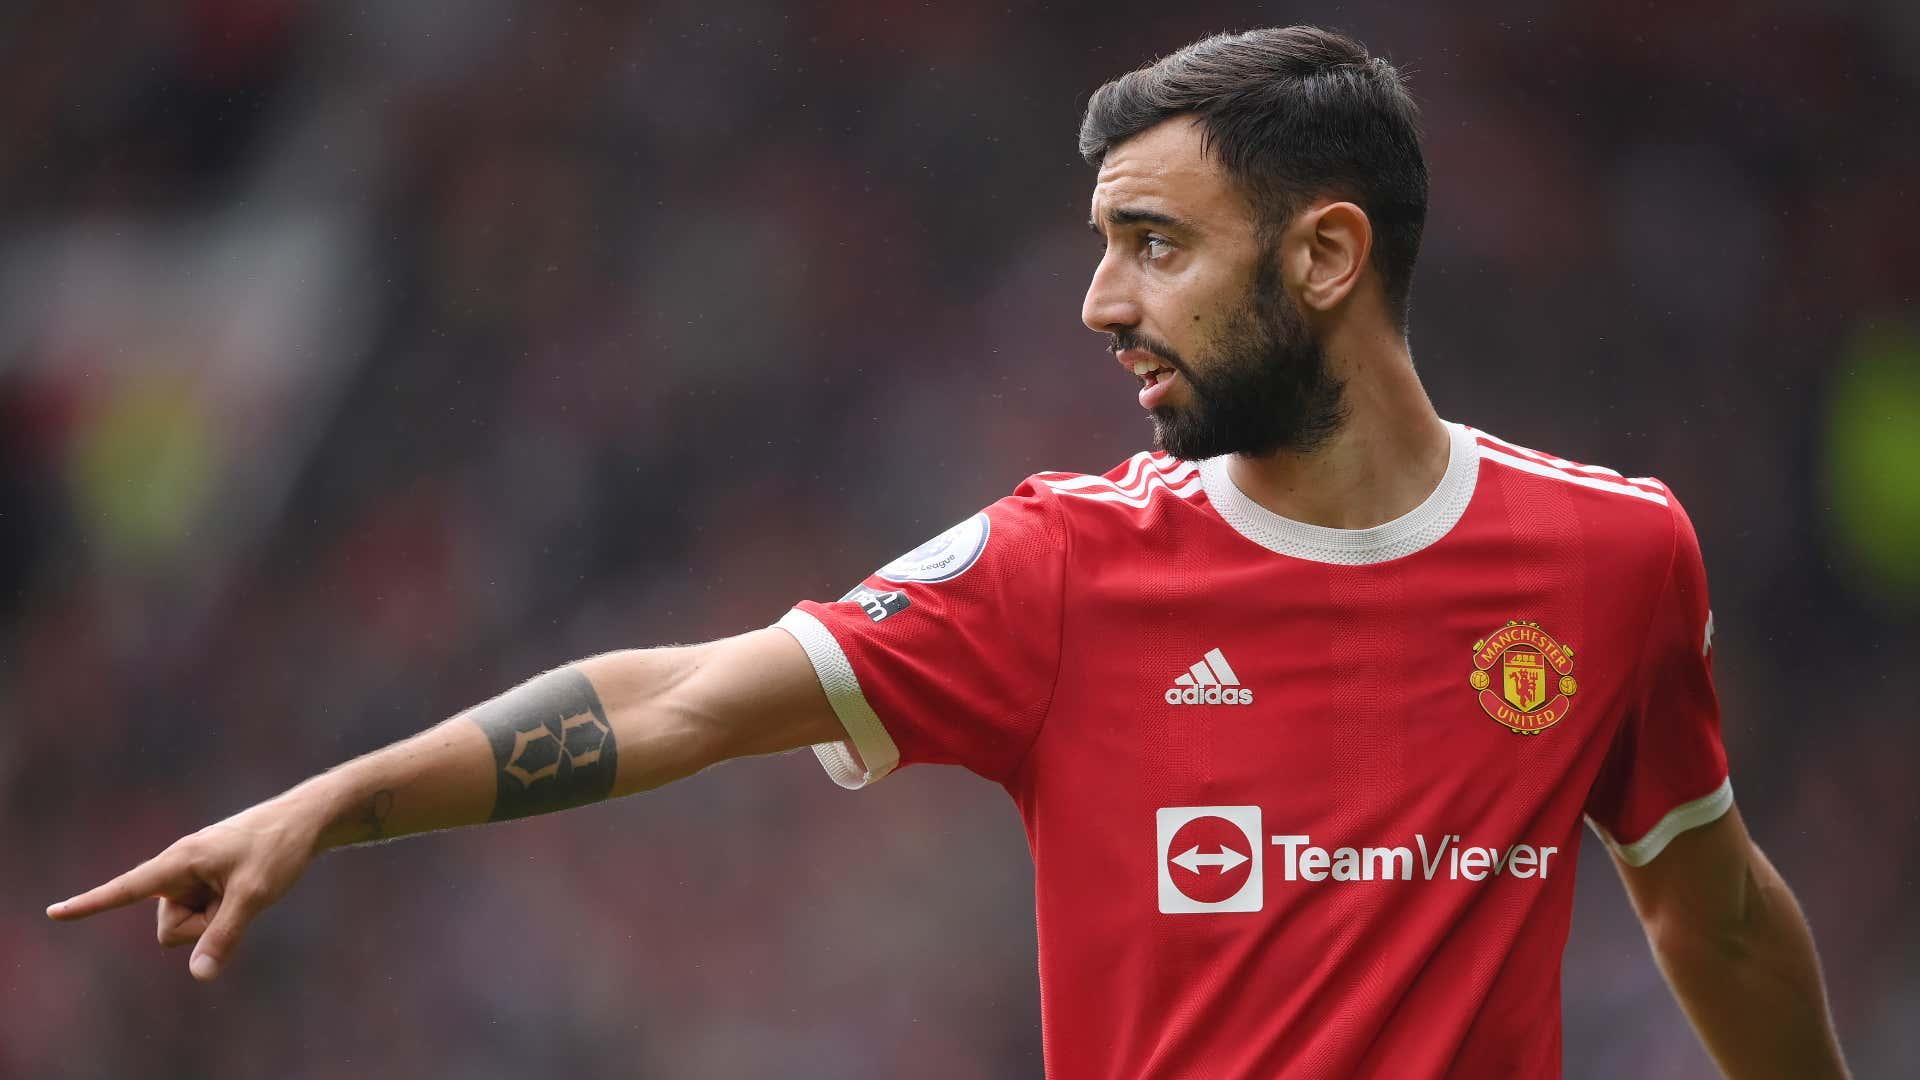 Fernandes doubtful for Manchester United clash with Liverpool, says Solskjaer   Goal.com